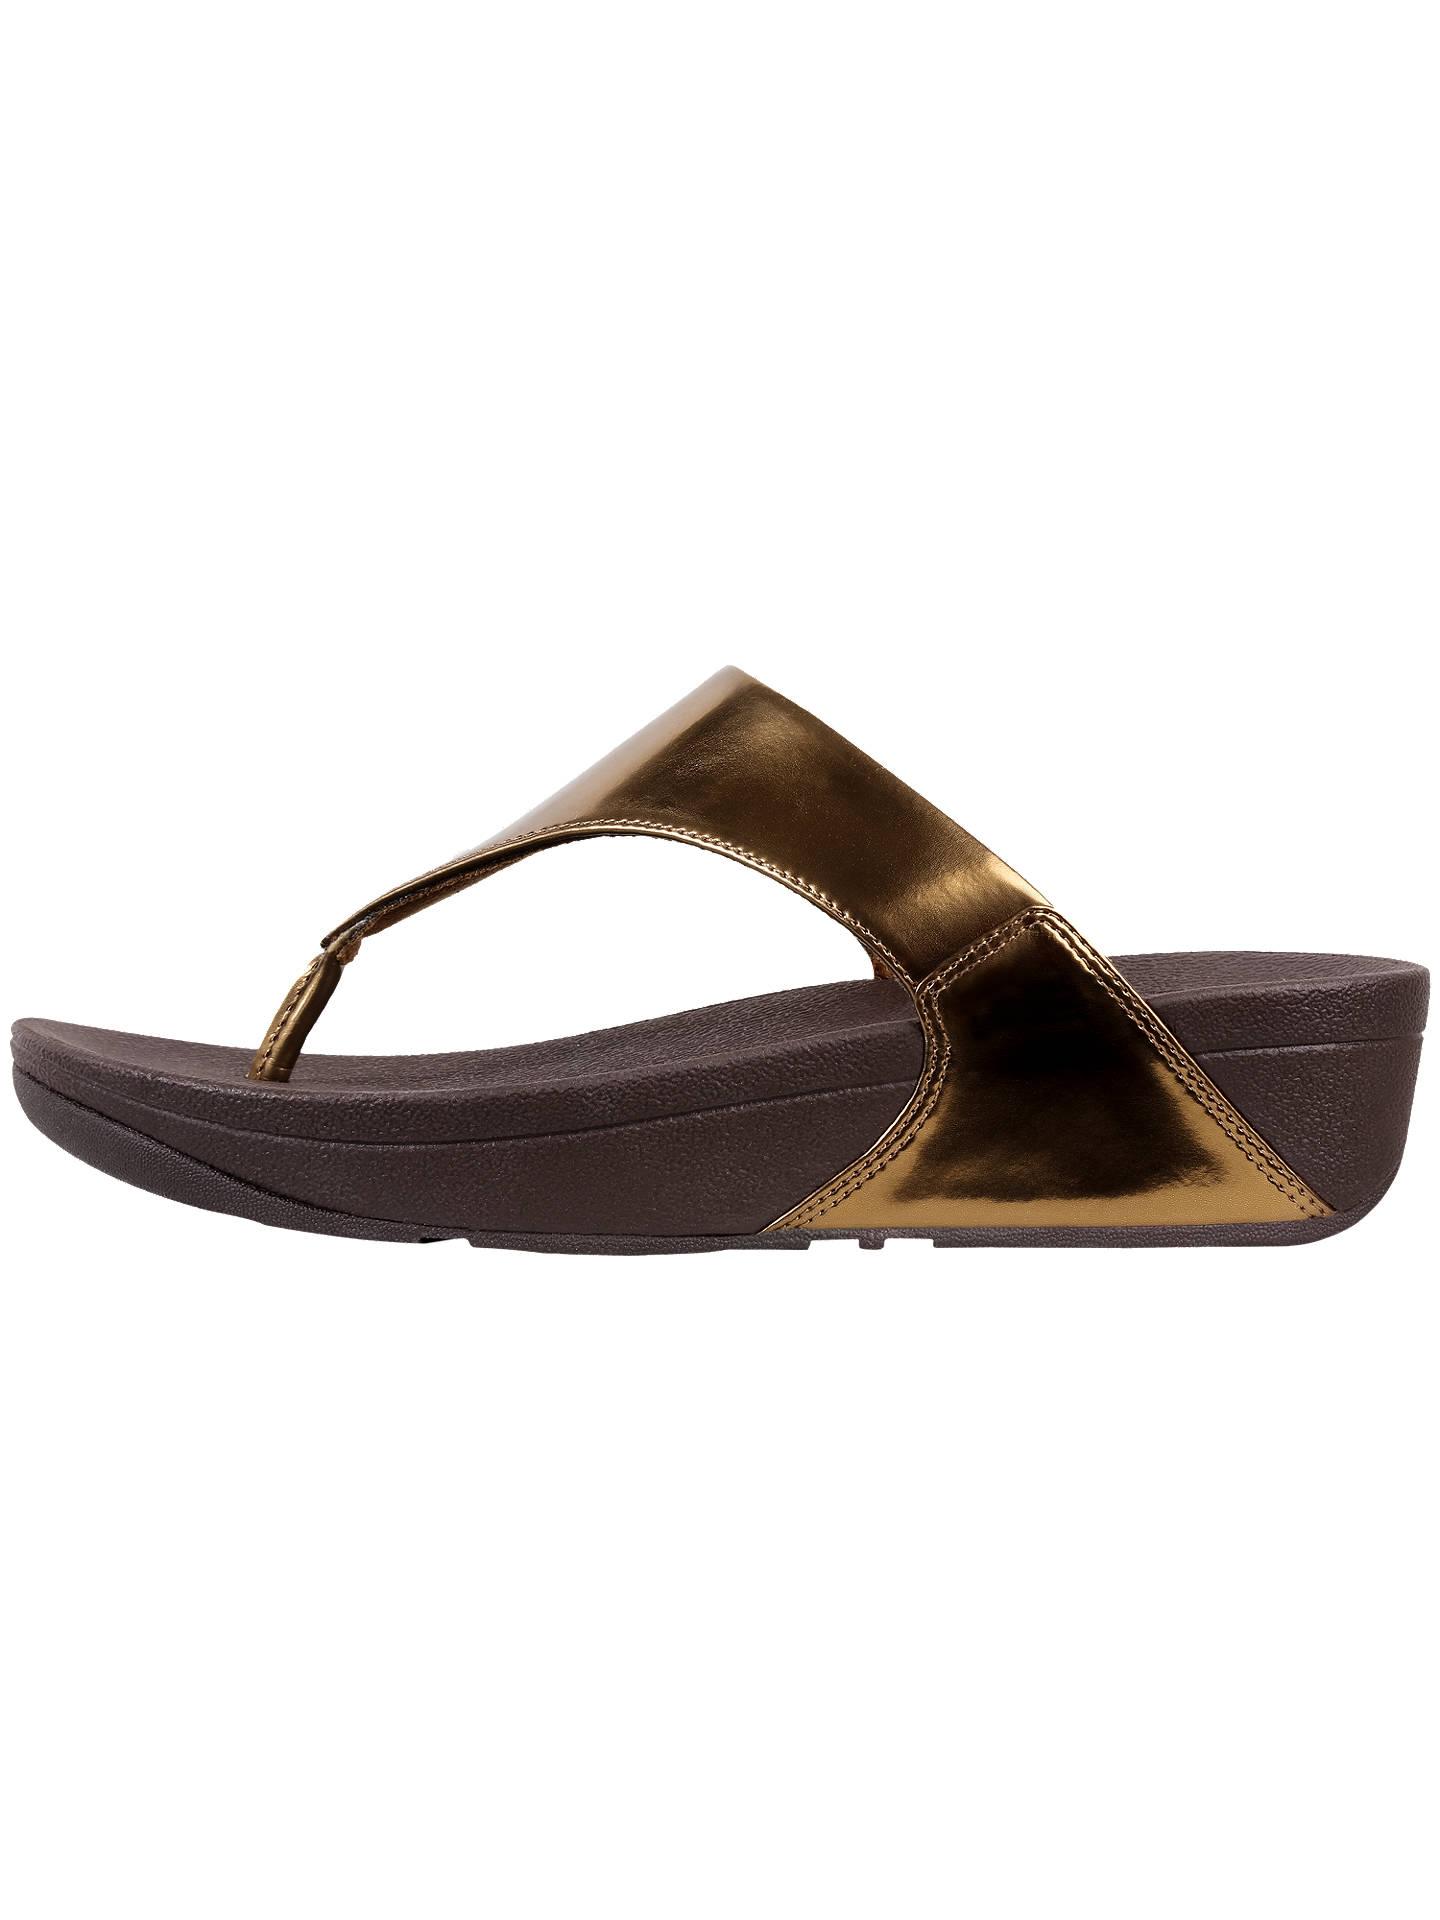 964f02a27 Buy FitFlop Lulu Toe Post Sandals